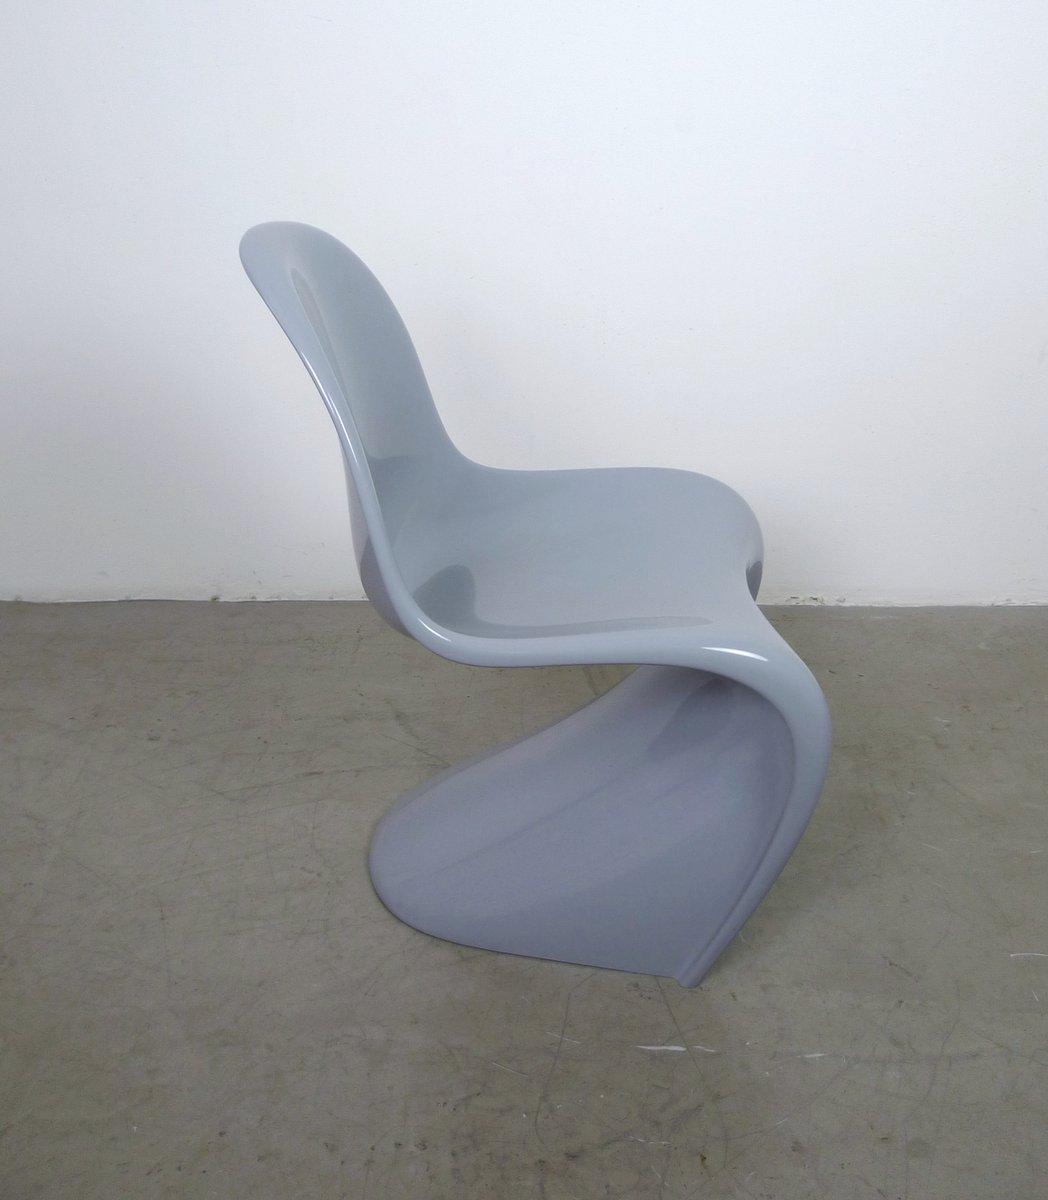 grauer panton chair classic von verner panton f r vitra 1998 bei pamono kaufen. Black Bedroom Furniture Sets. Home Design Ideas